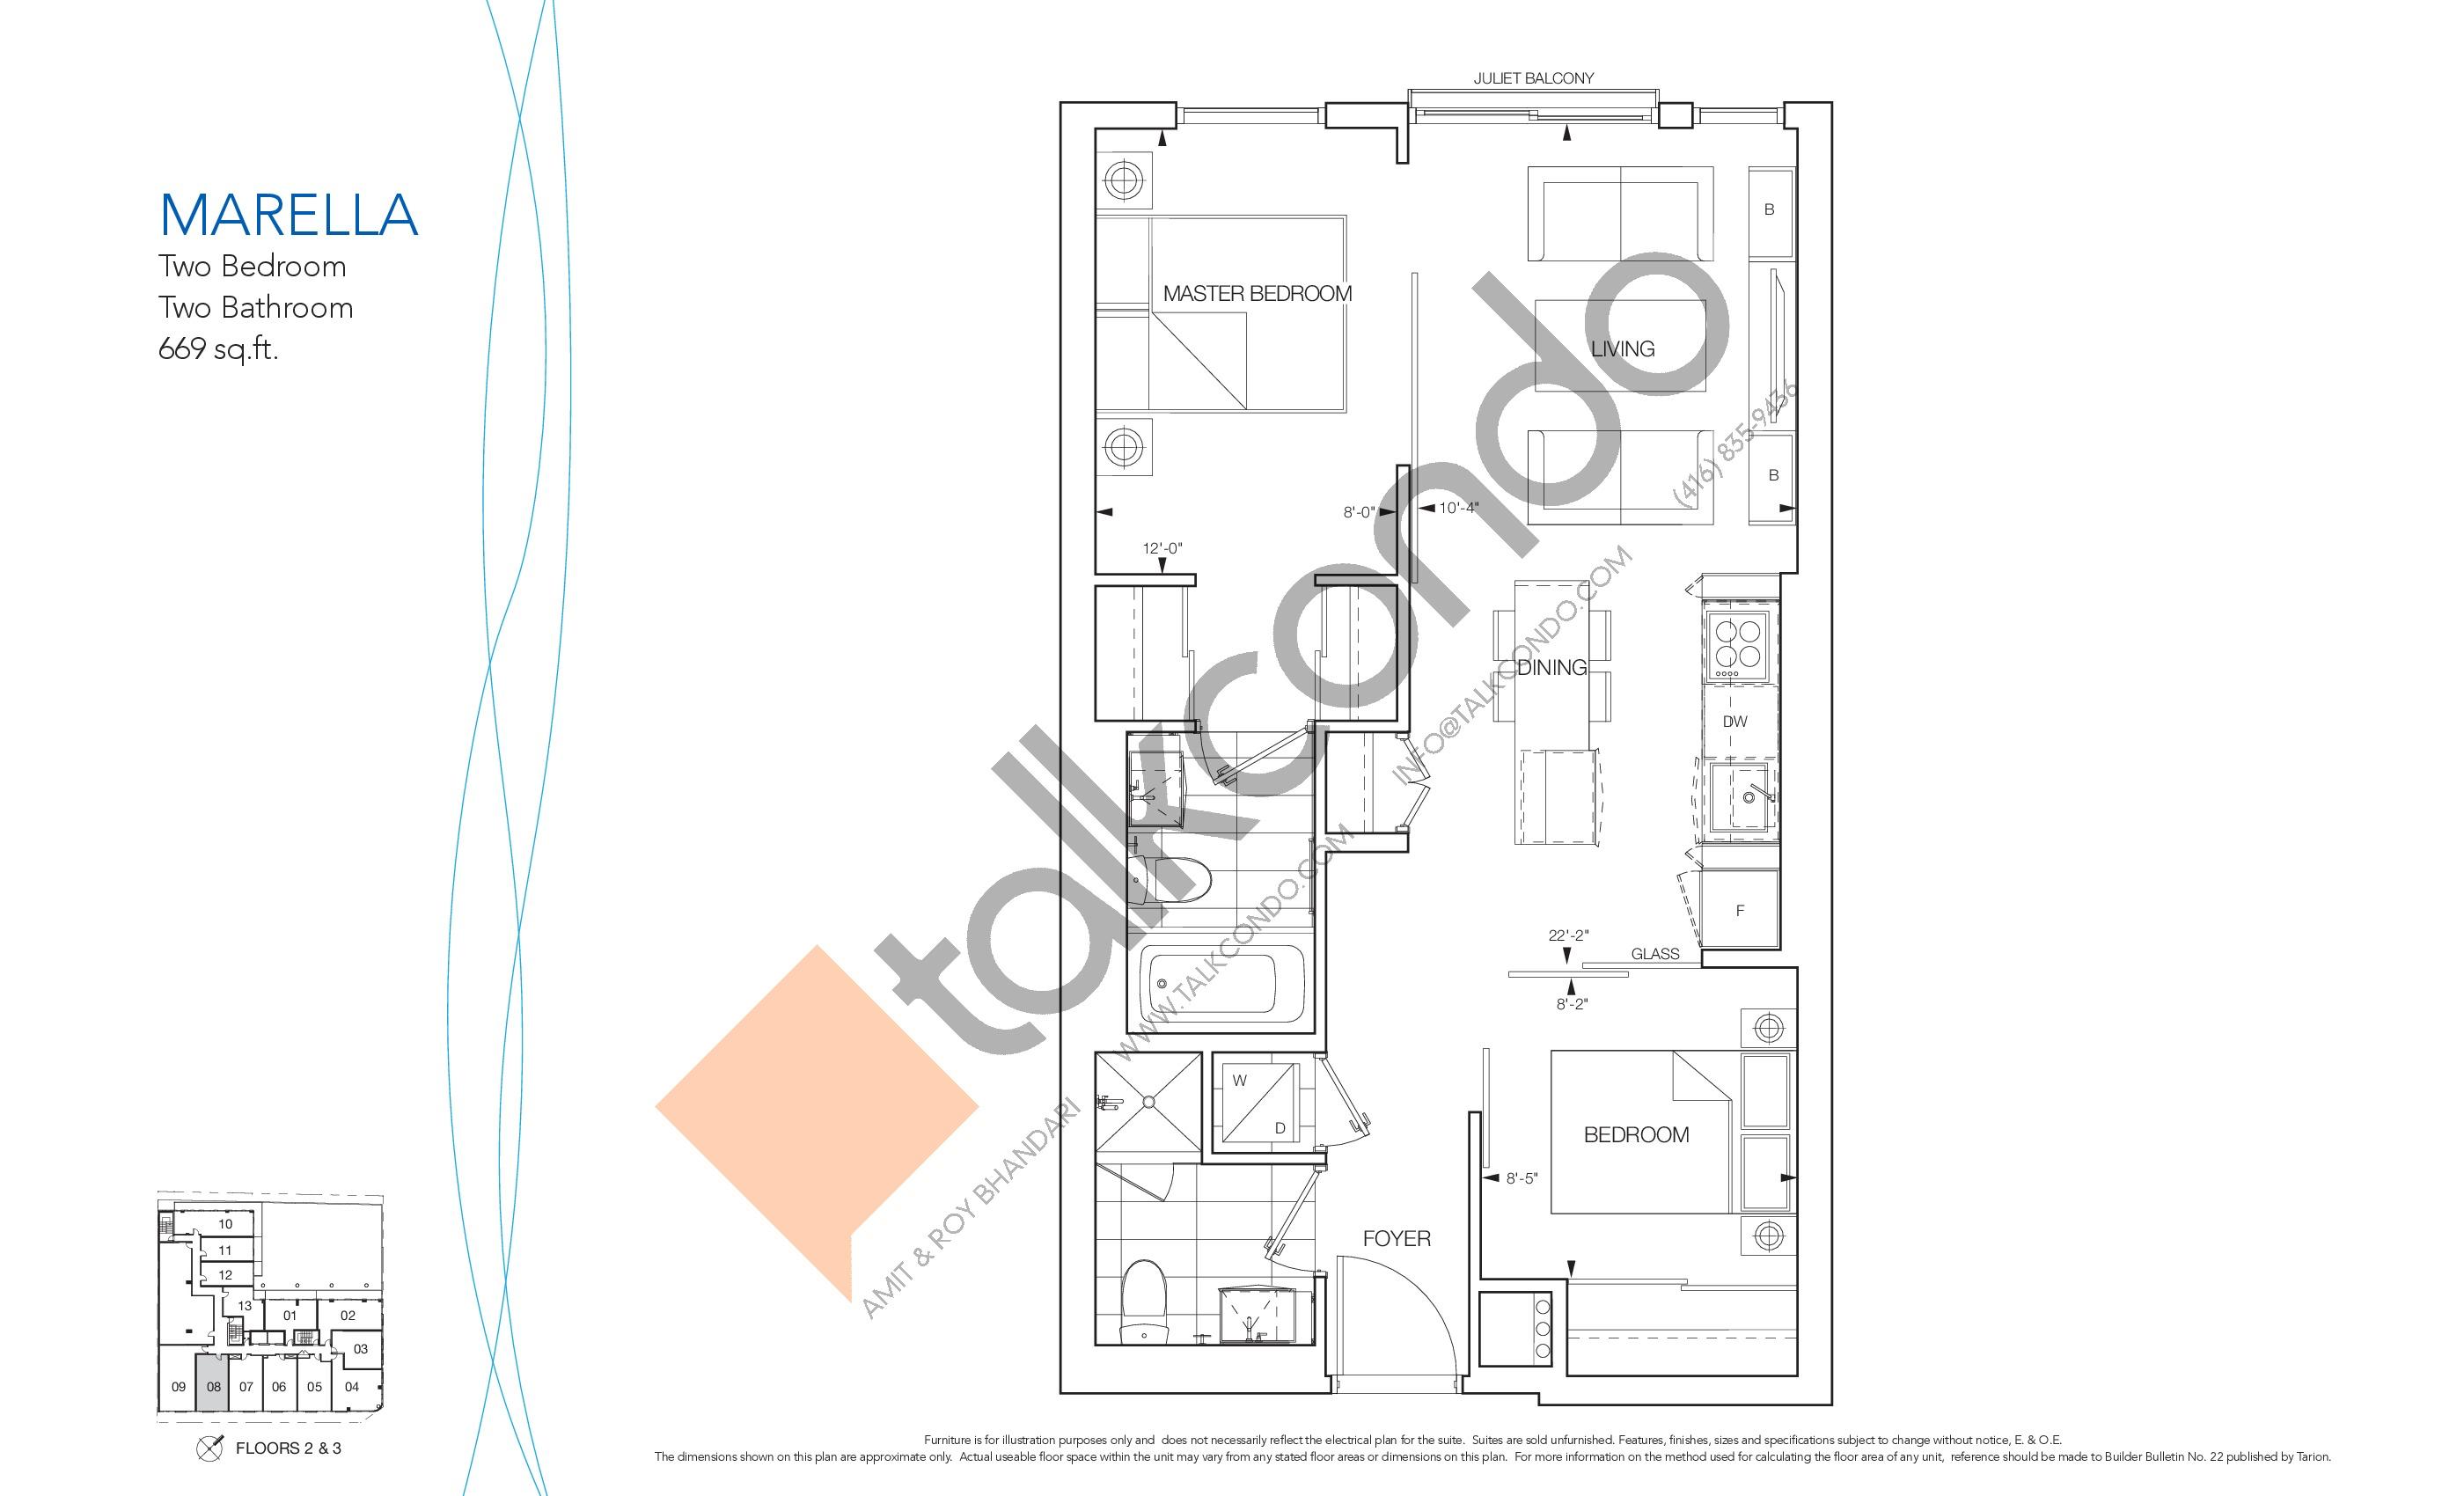 Marella Floor Plan at Nautique Lakefront Residences - 669 sq.ft